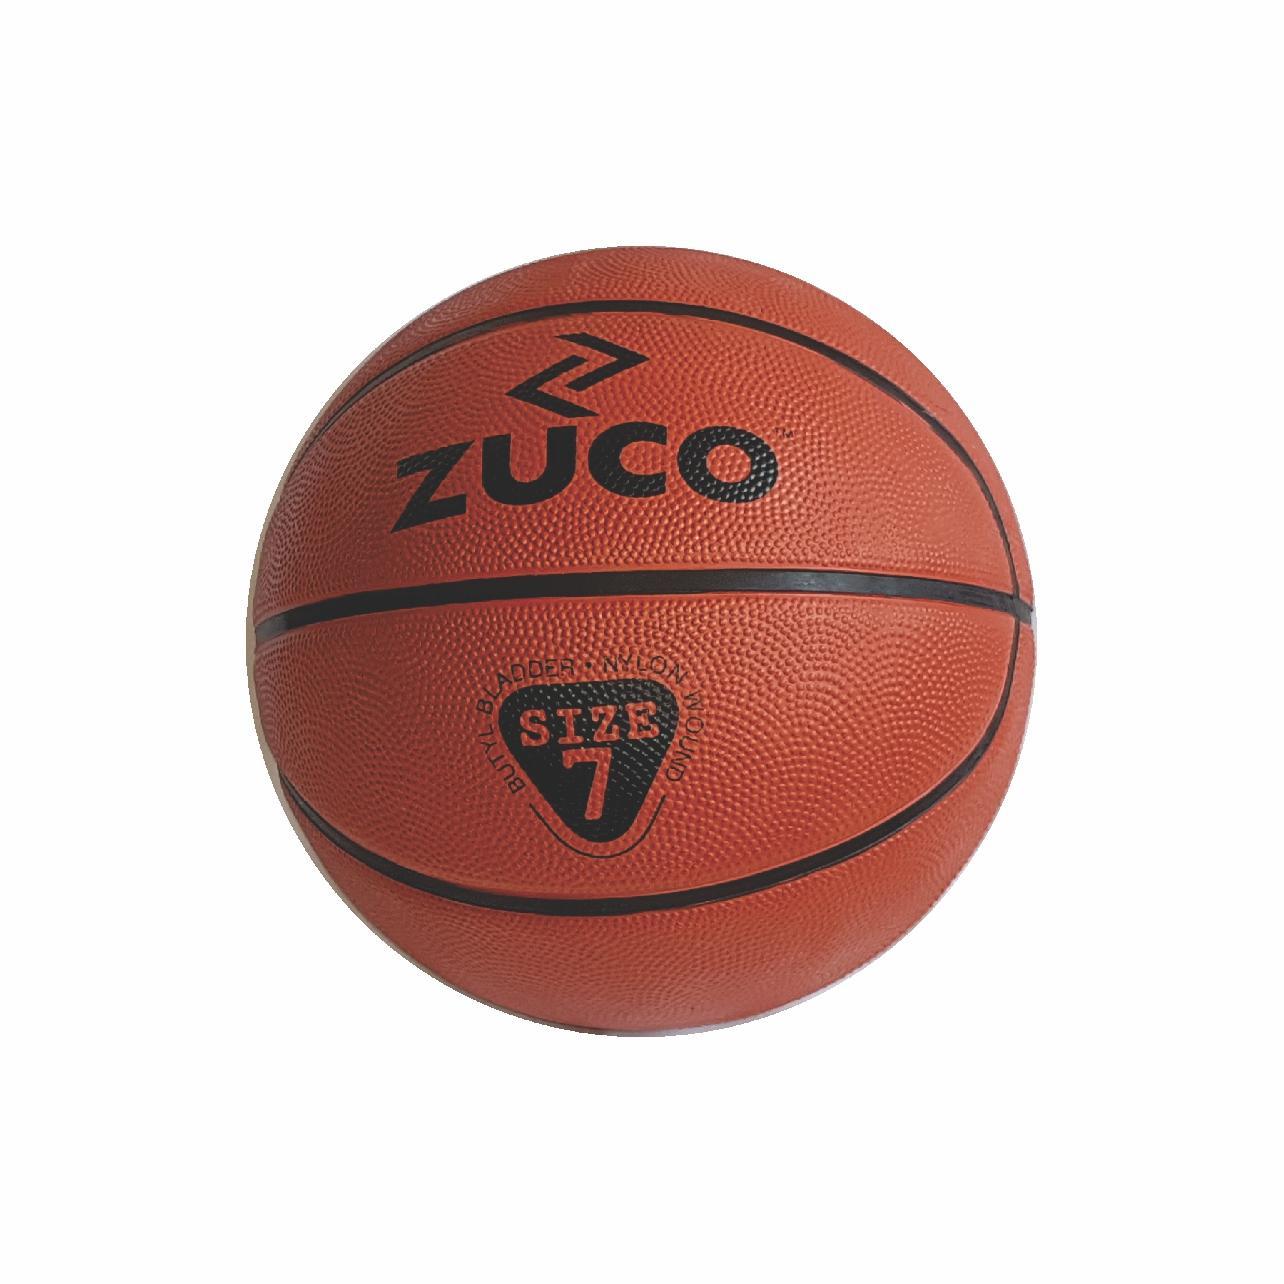 Zuco Basketball Match